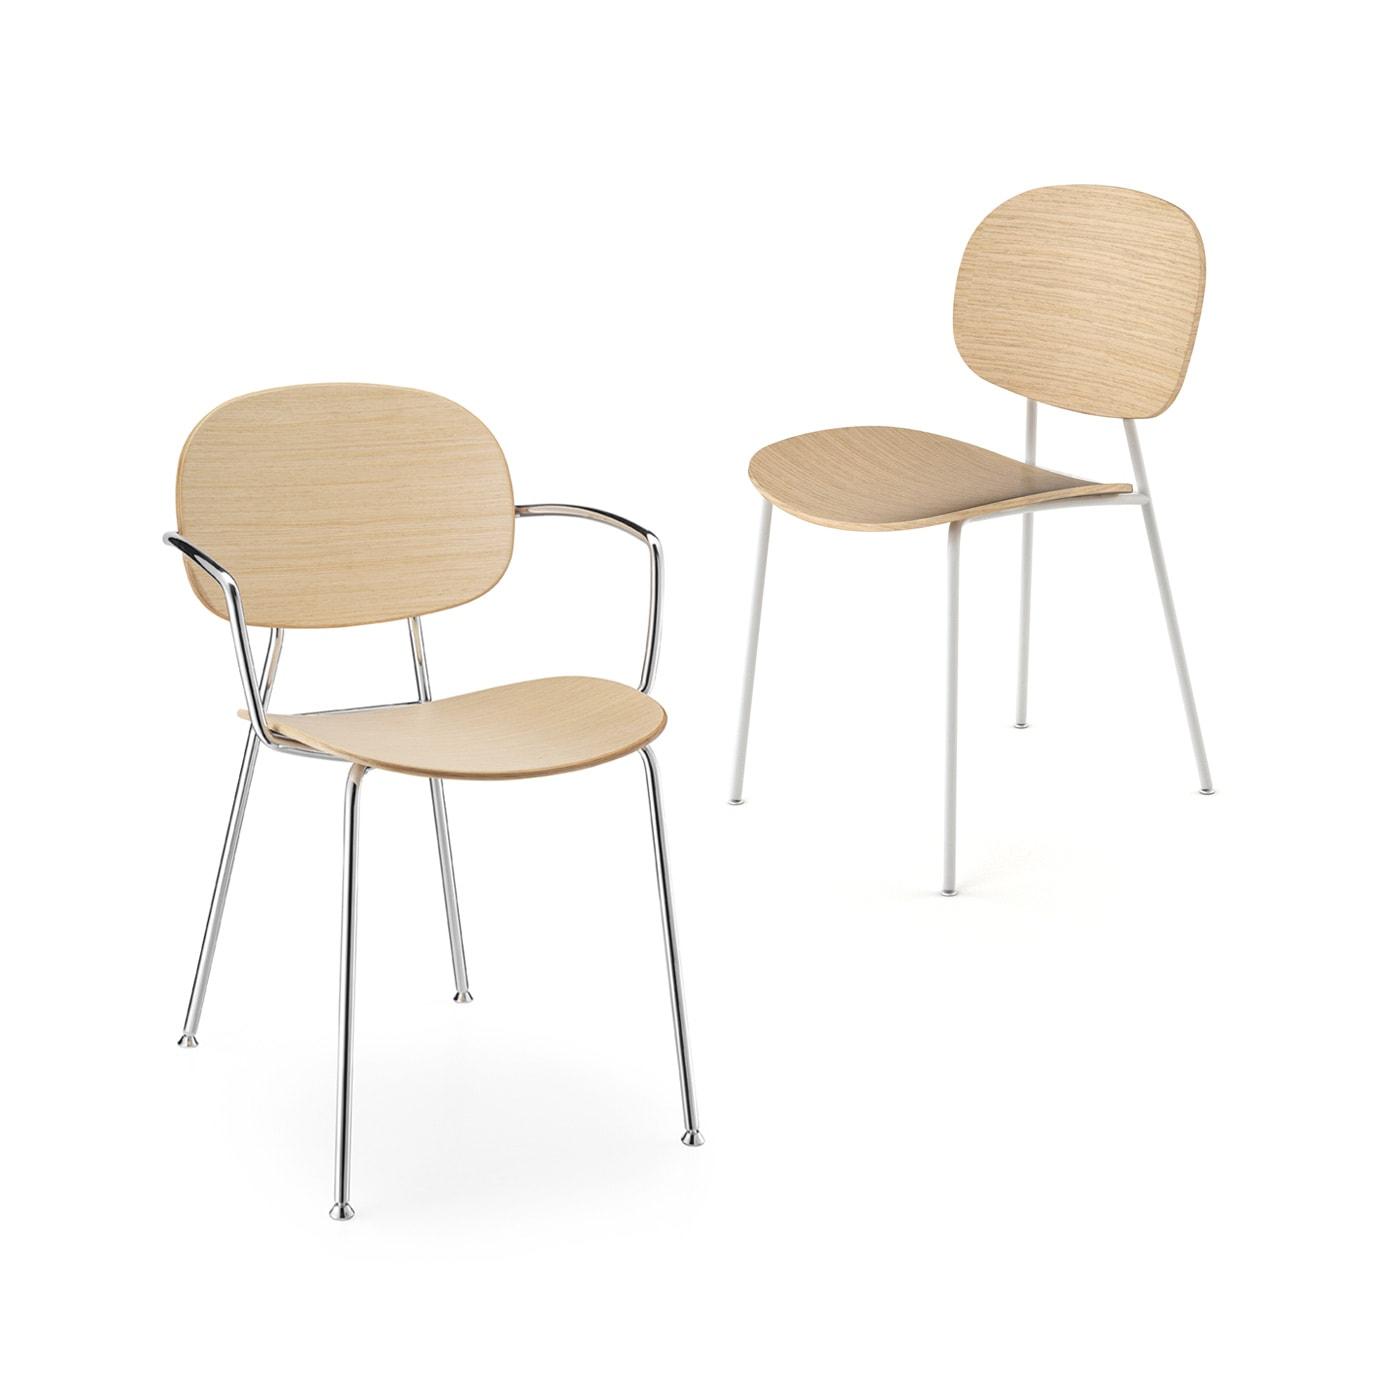 INFINITI Tondina 4Legs sedia scocca legno